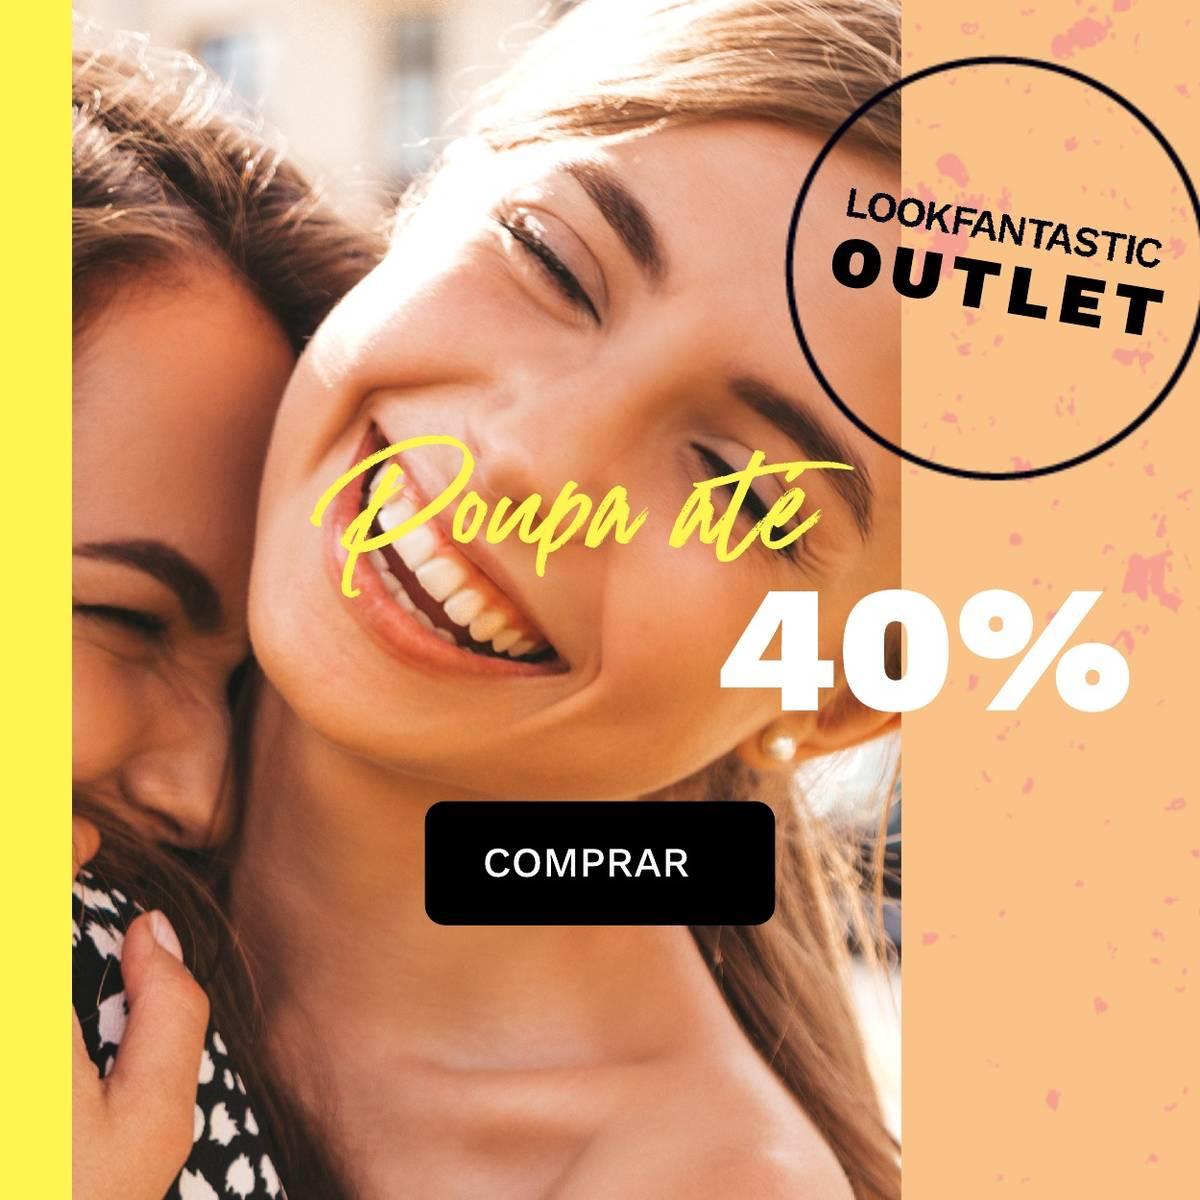 poupa até 40% no outlet da lookfantastic